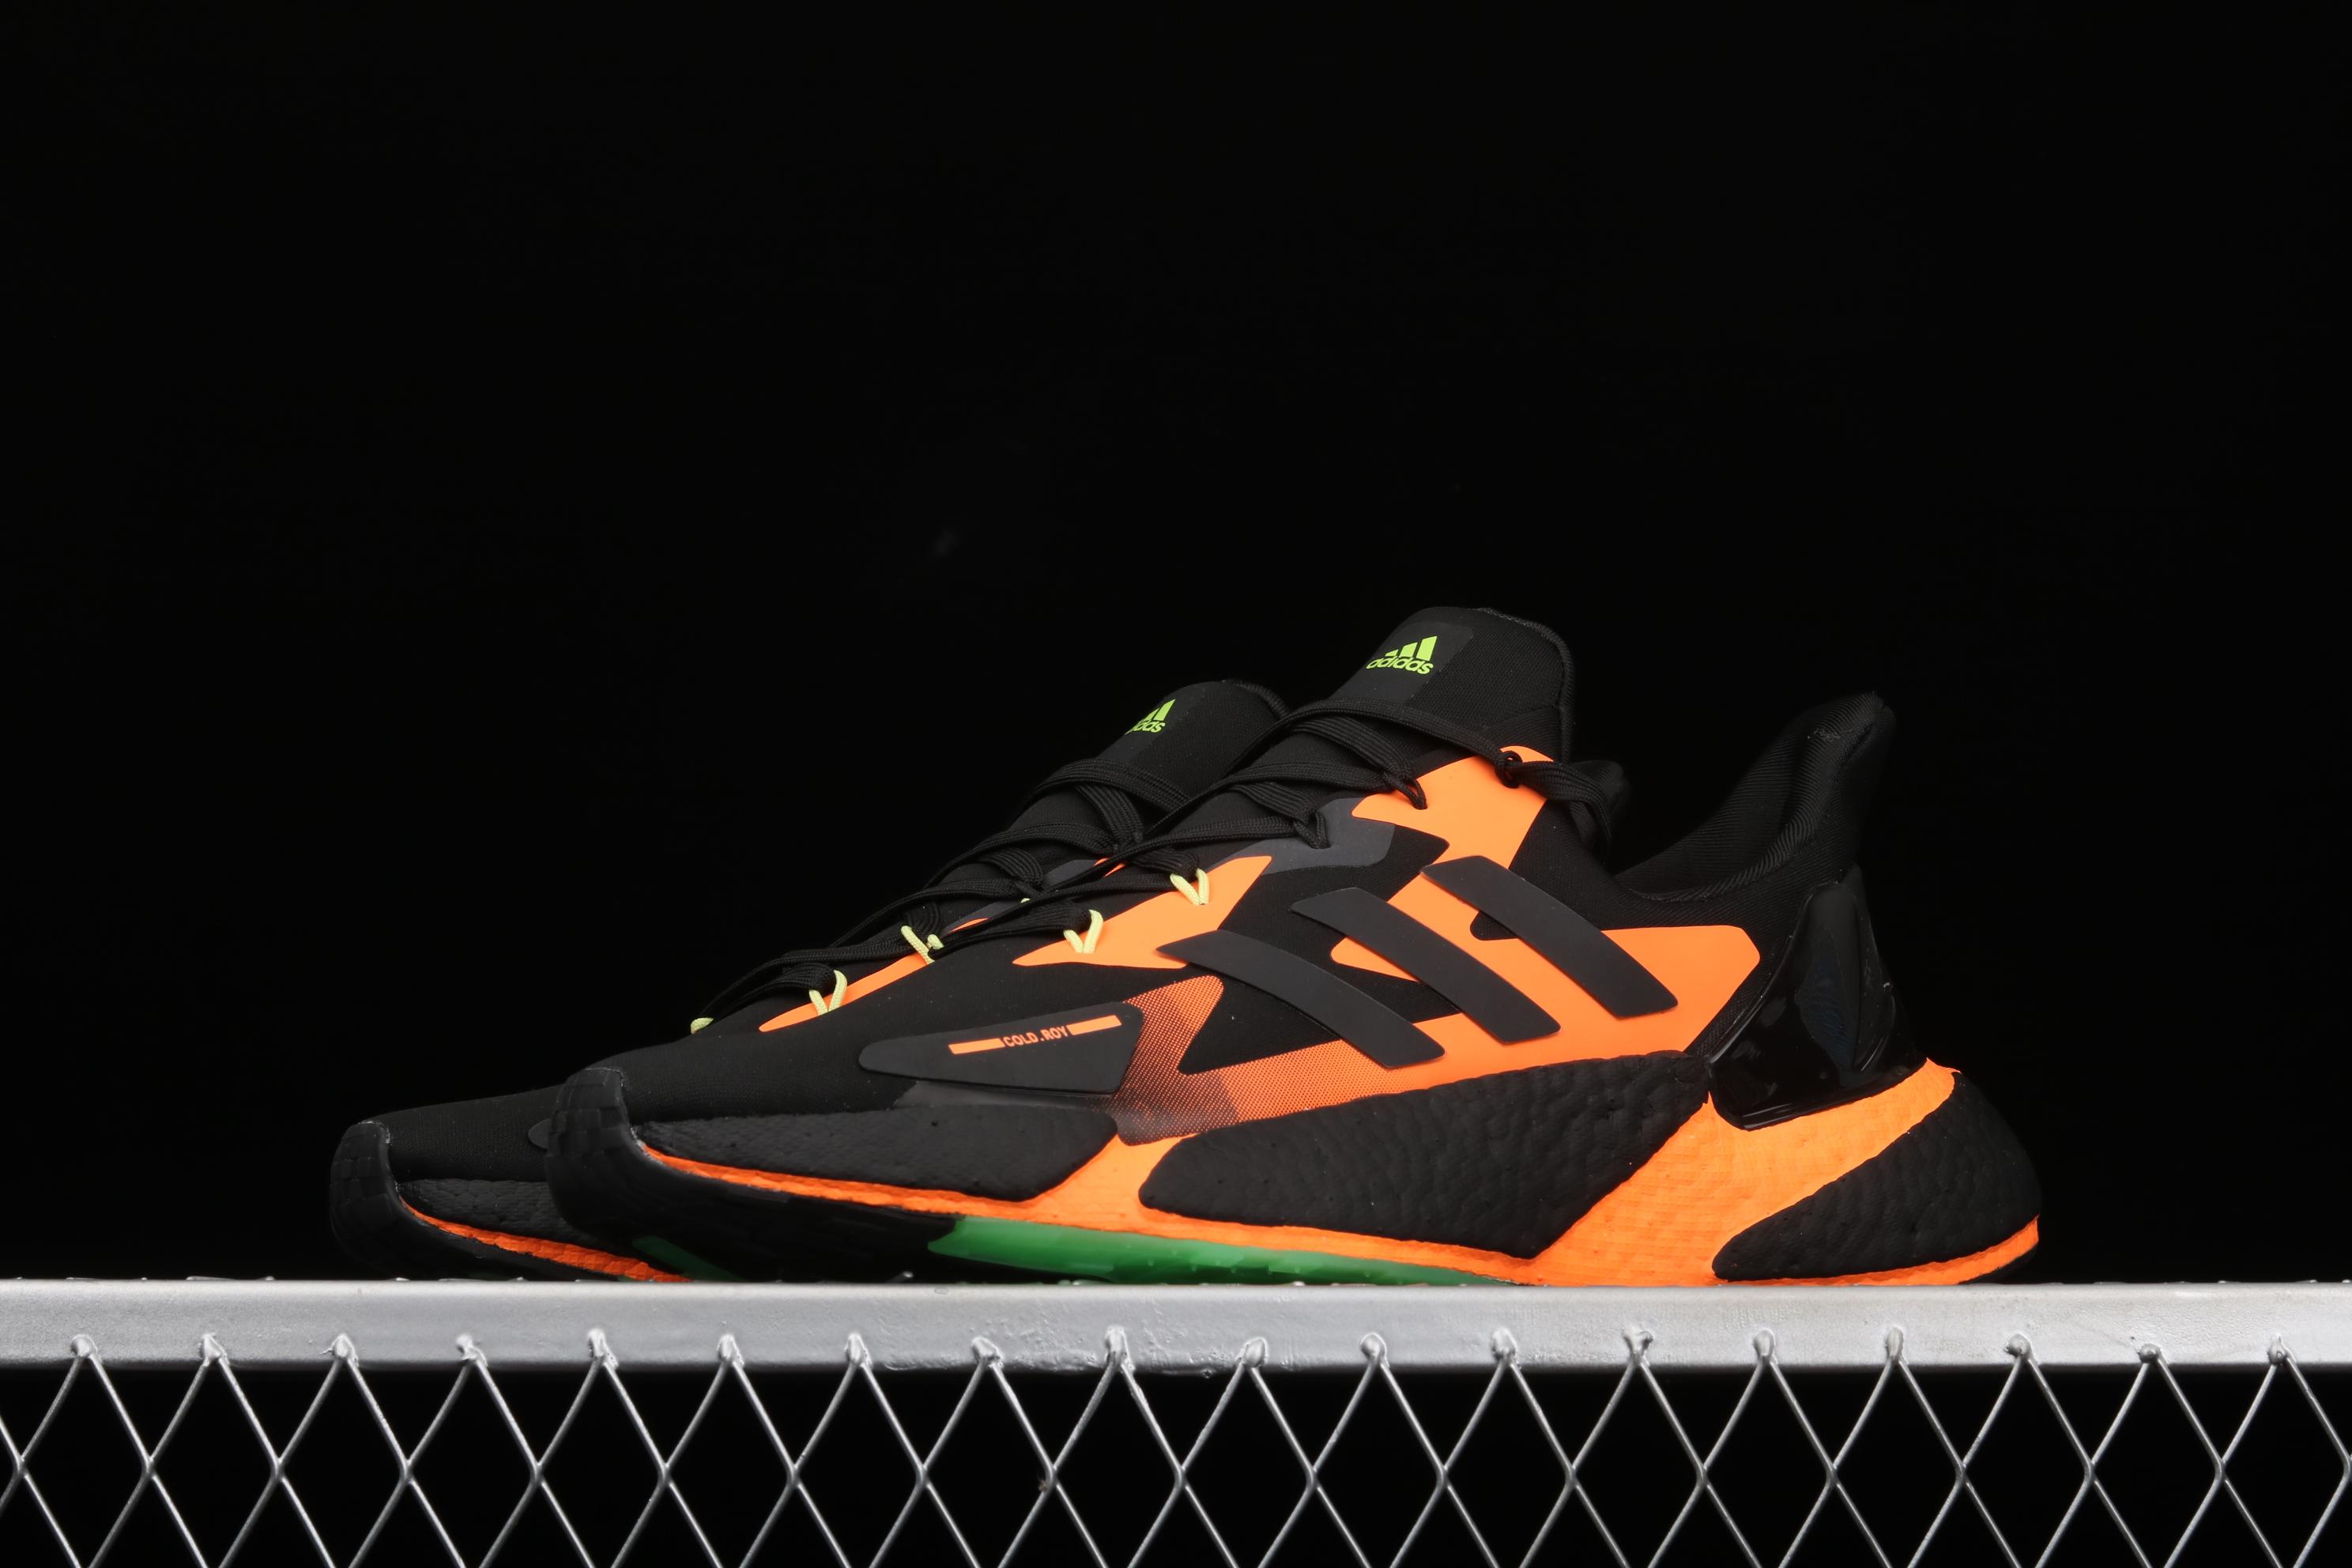 Ad X9000L4 Boost G54885 阿迪新款复古爆米花跑鞋